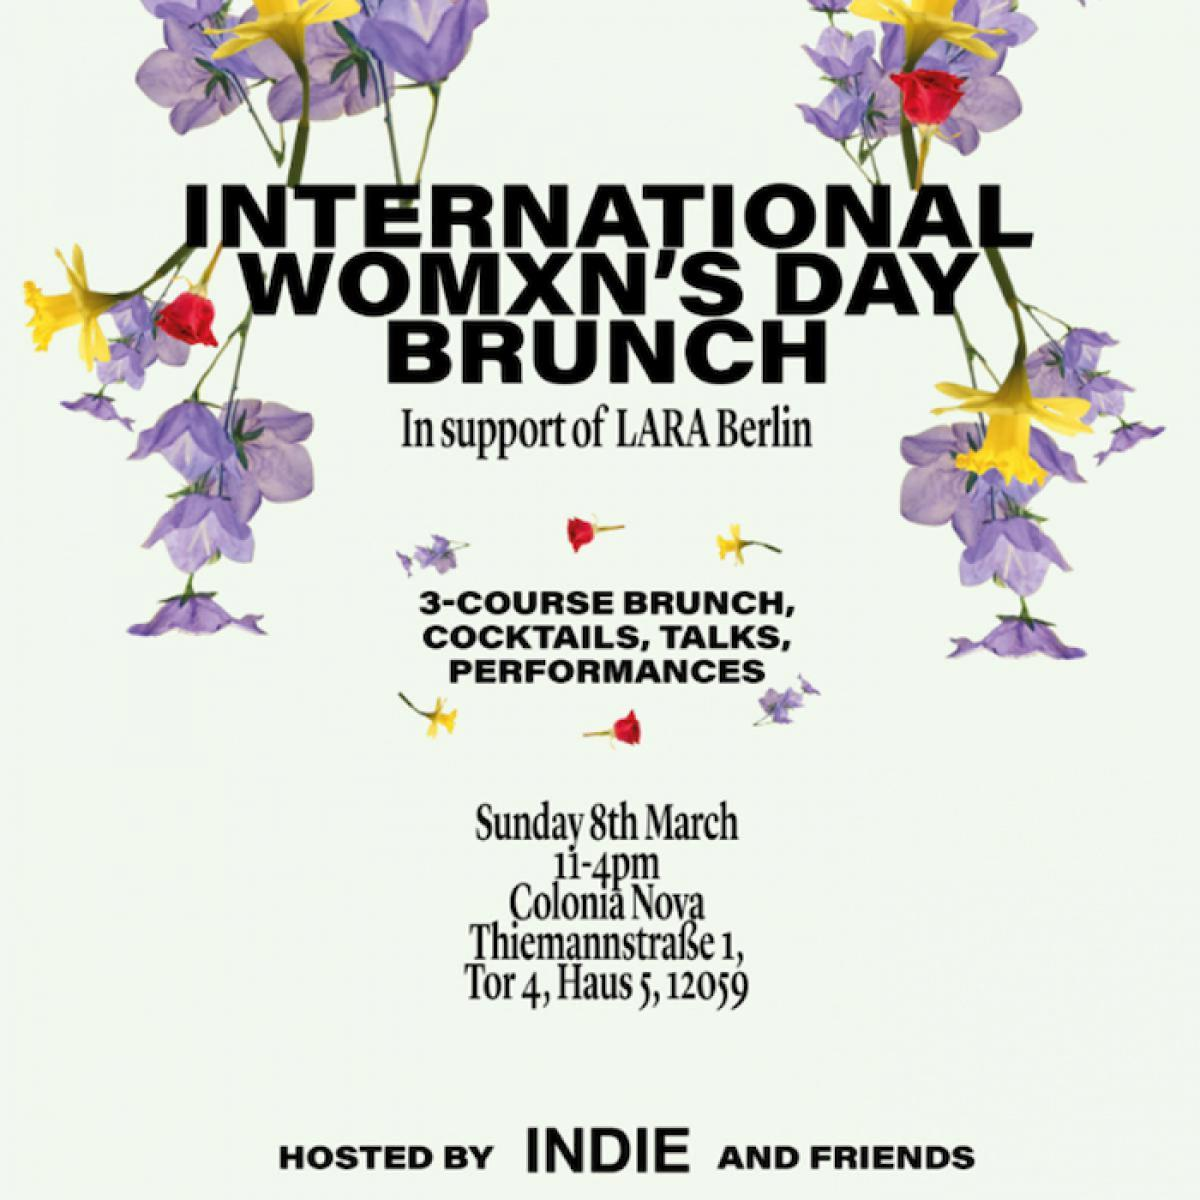 Colonia Nova - International Women's Day Brunch